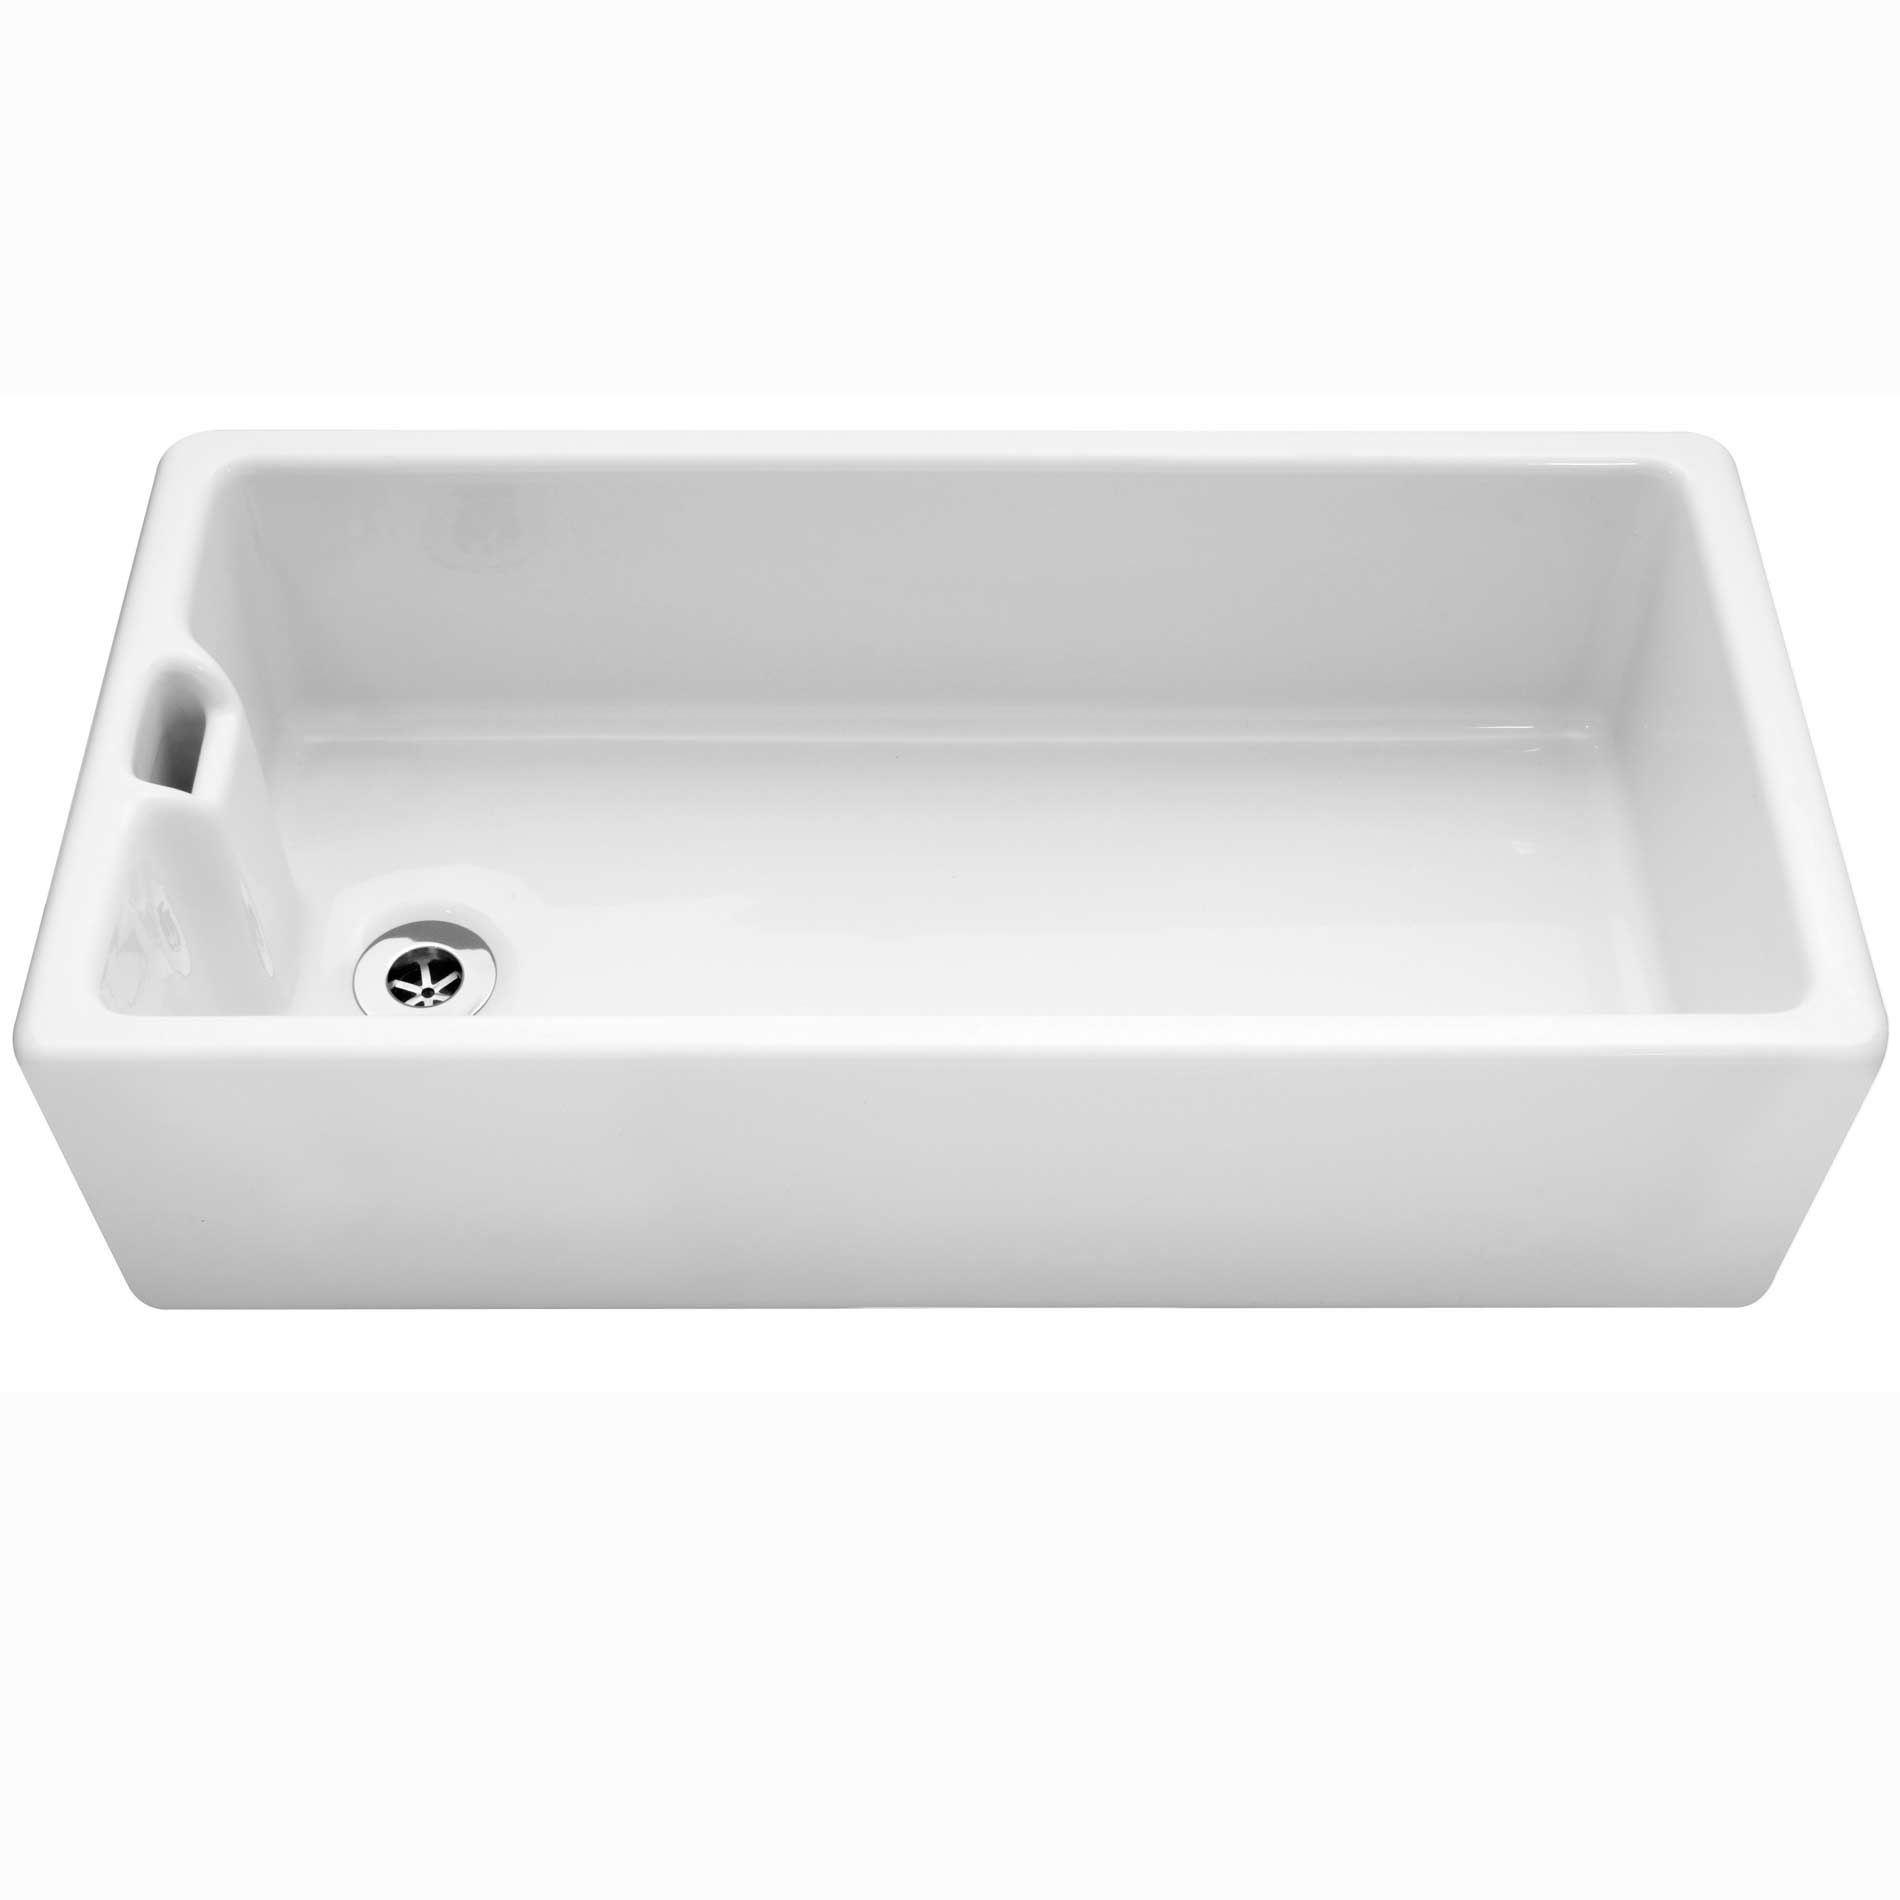 Caple Belfast 915 Ceramic Single Bowl Sink Kitchen